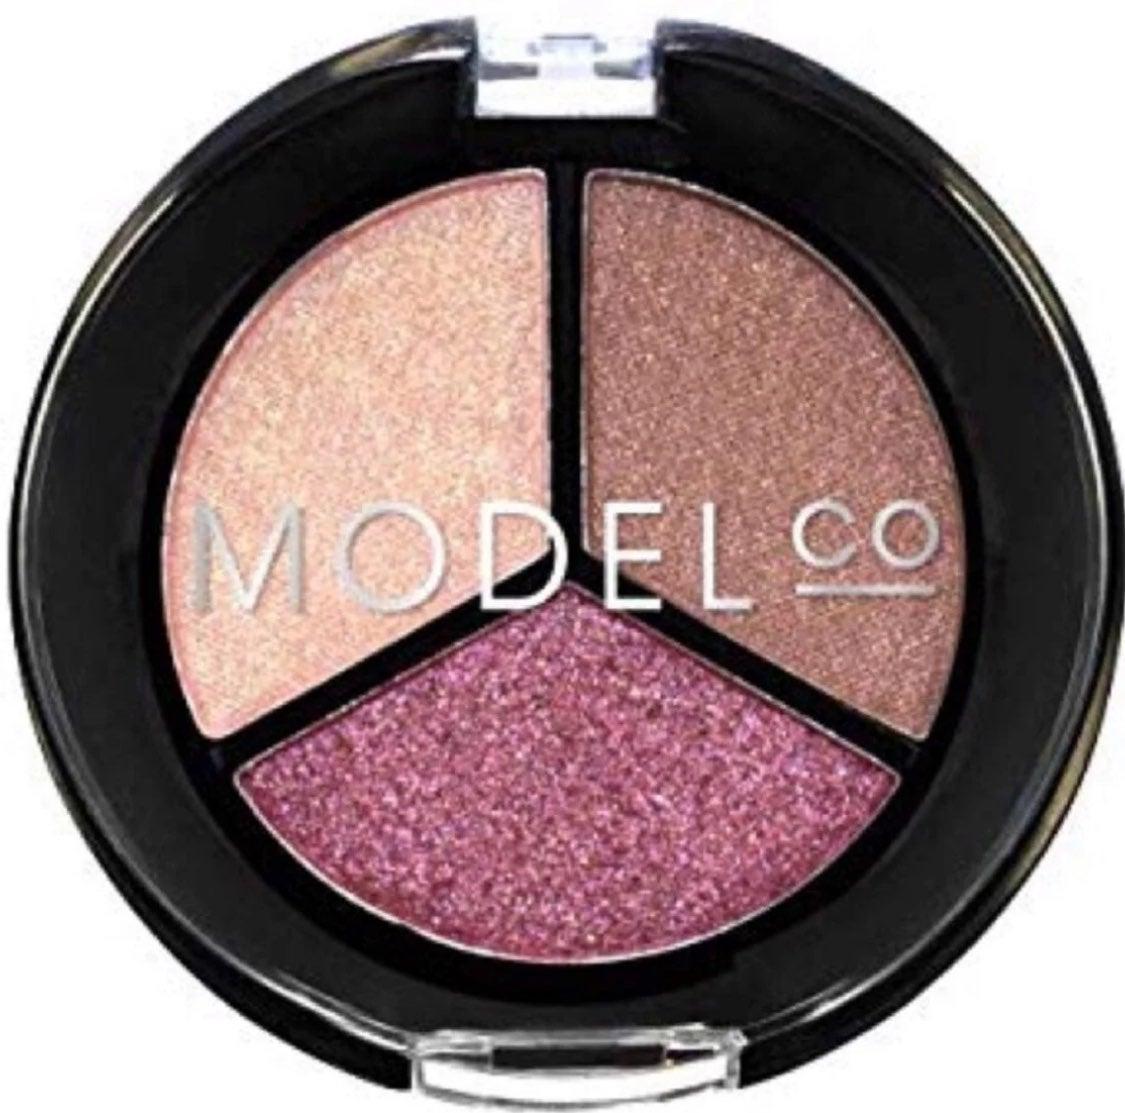 Model Co Metallic Eye Shadow Trio - Myko